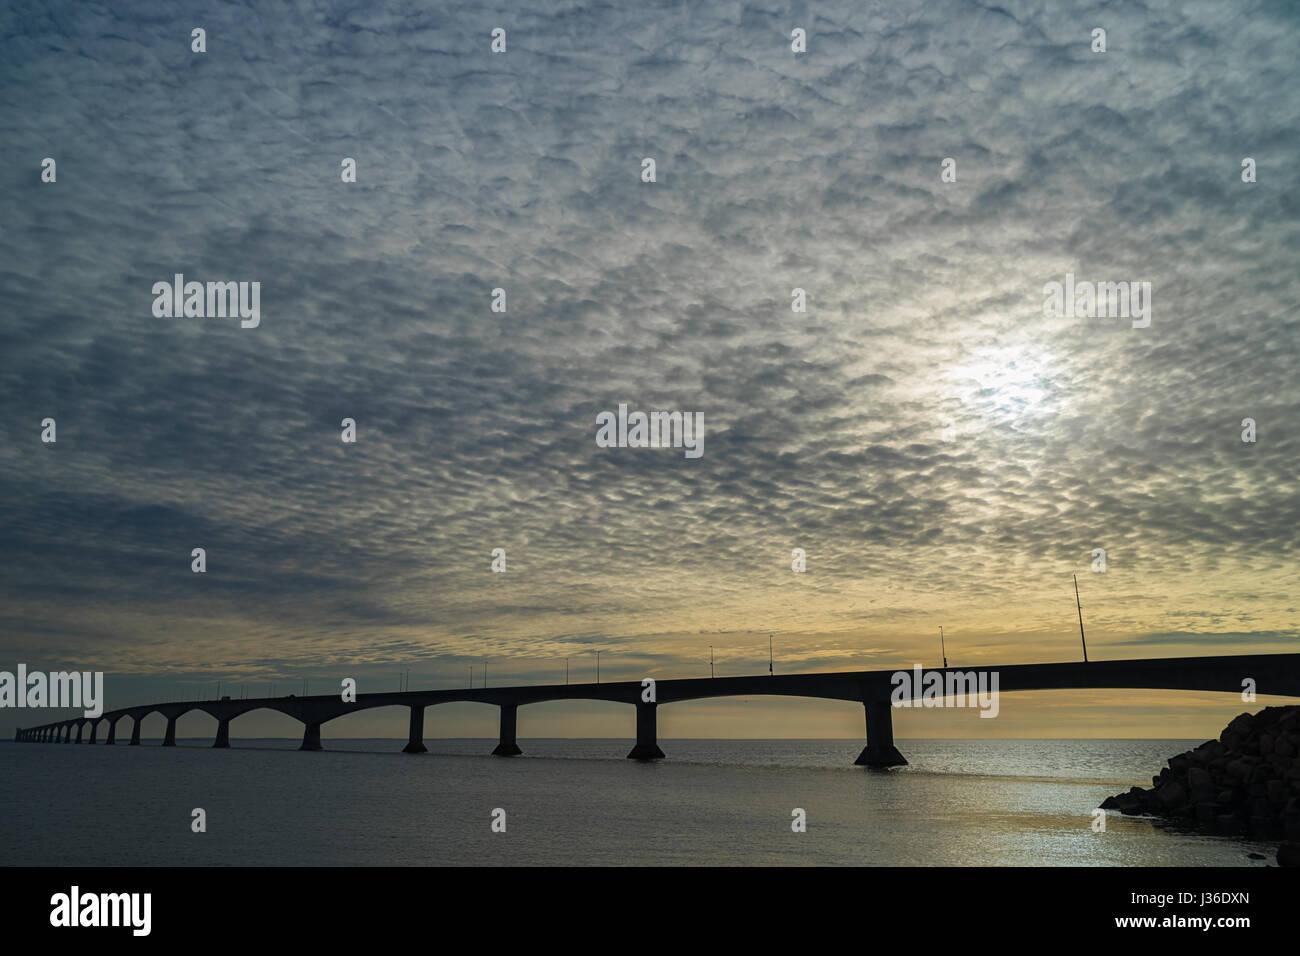 Bewölktem Himmel über die Confederation Bridge verbindet Prince-Edward-Insel mit dem Festland New Brunswick, Kanada. Stockfoto